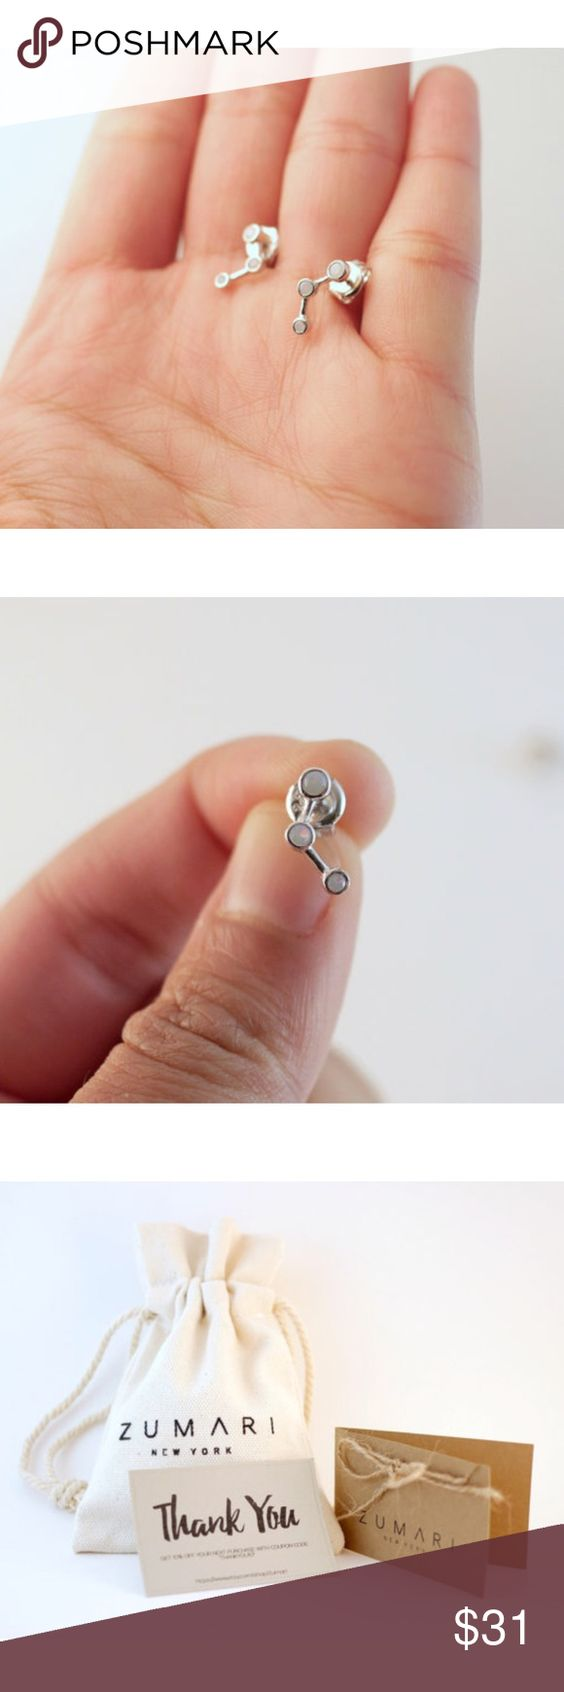 Selling this Opal Earring Climbers | Sterling Silver on Poshmark! My username is: zumari. #shopmycloset #poshmark #fashion #shopping #style #forsale #ZUMARI #Jewelry